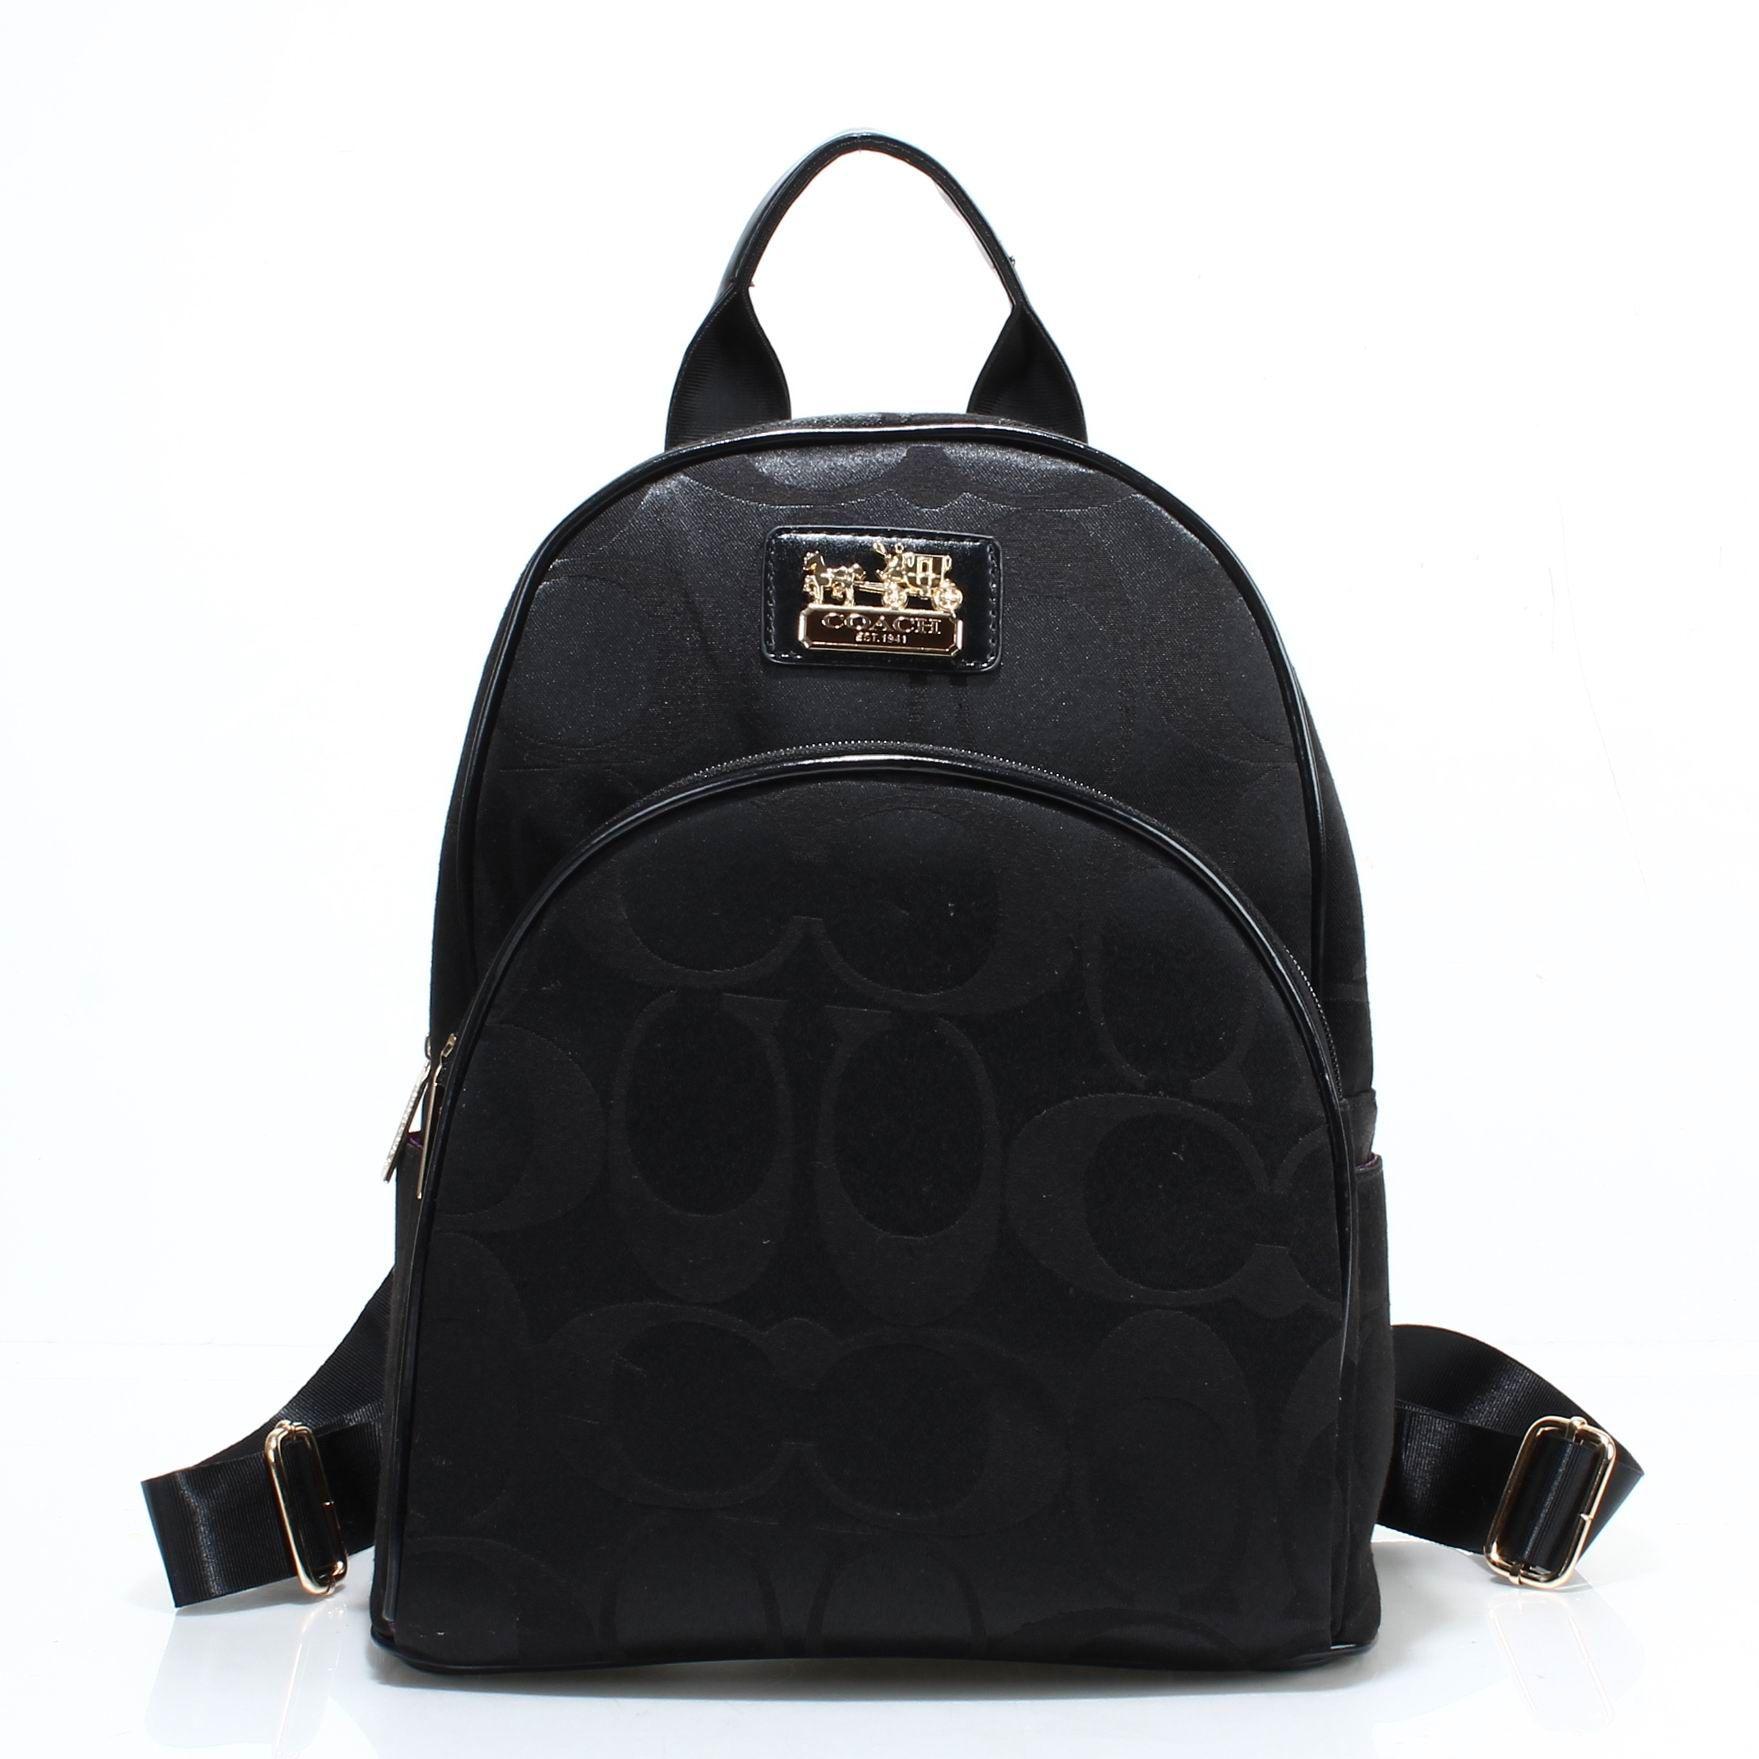 Coach bags 2015 new black backpack coach handbags